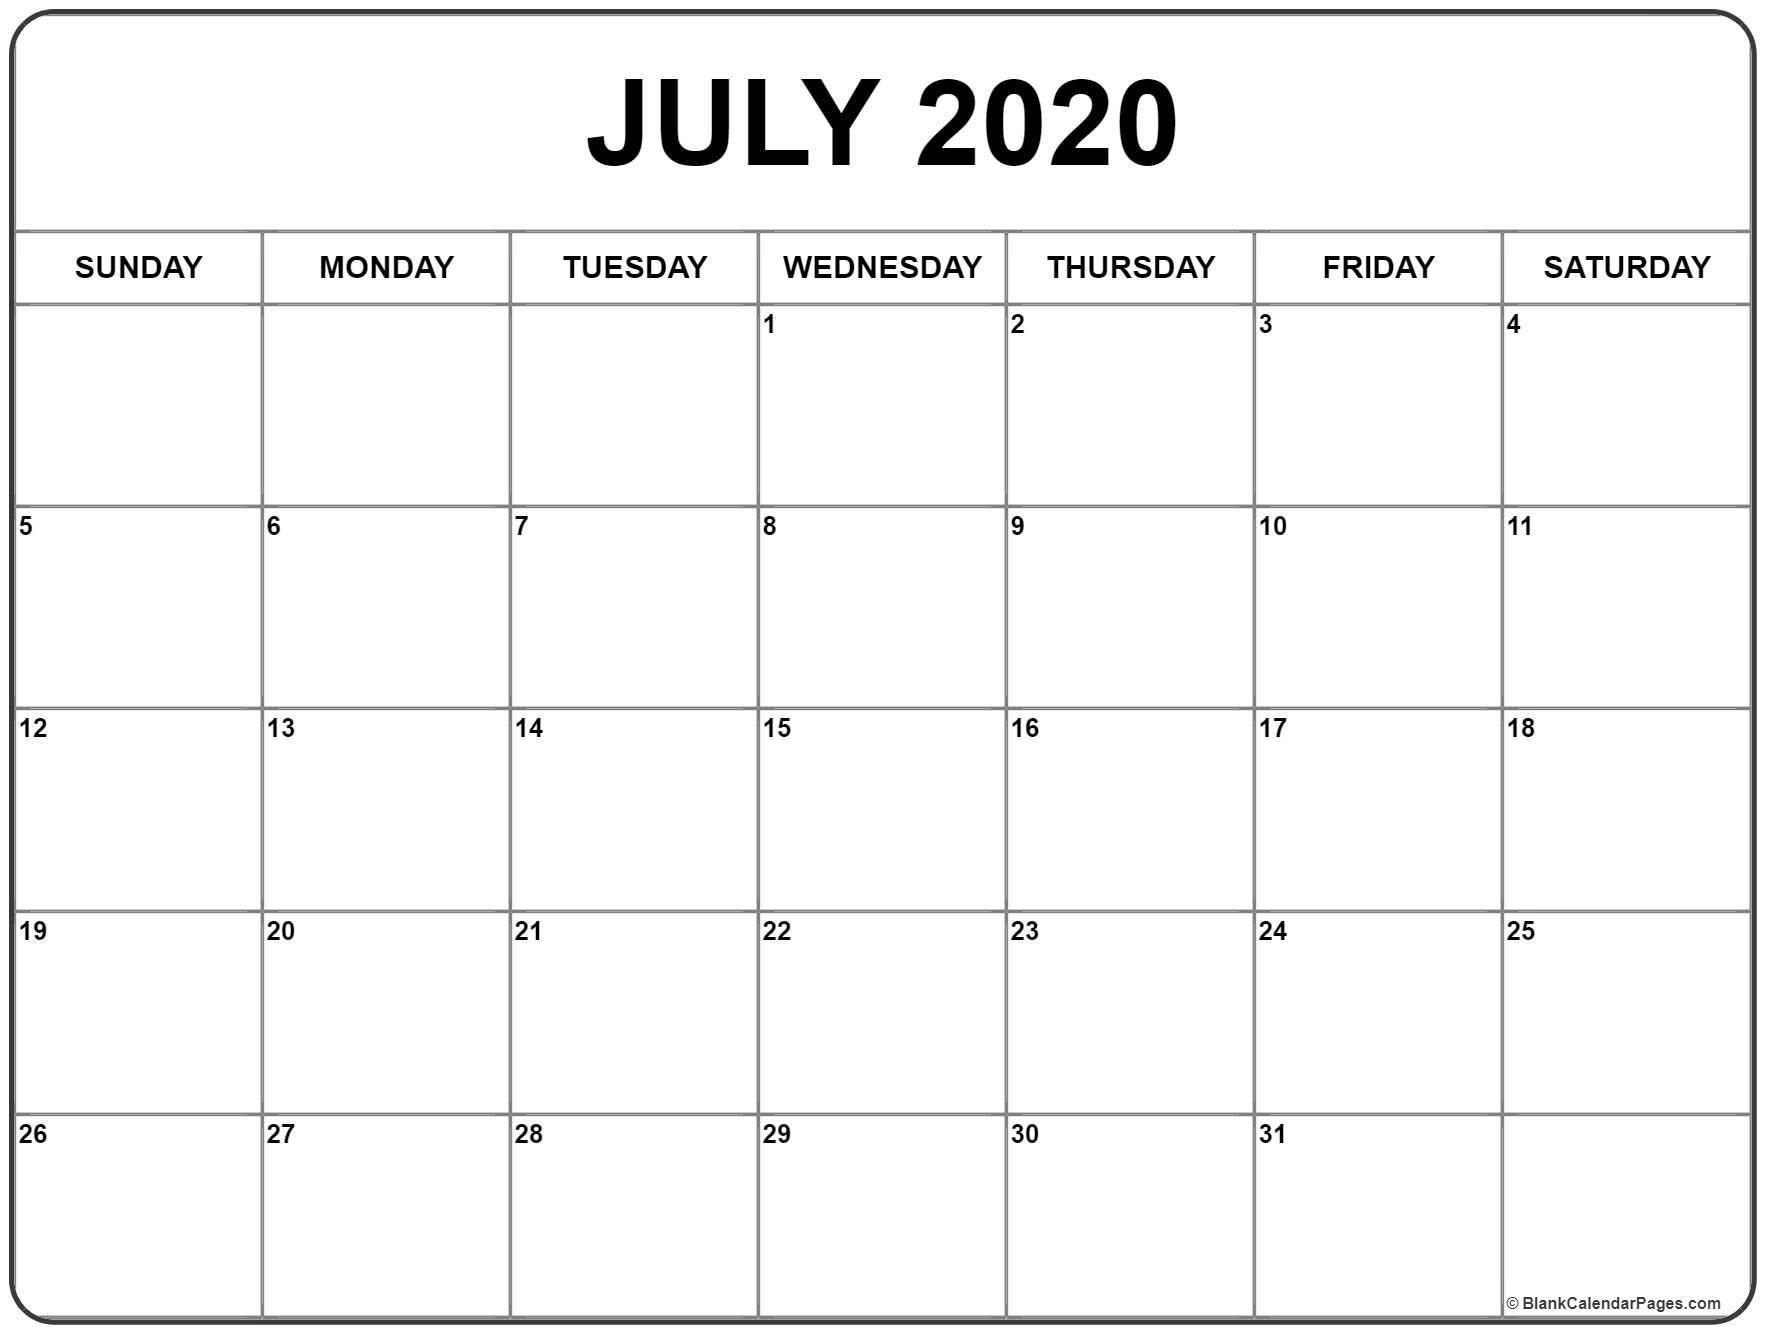 July 2020 Calendar | Printable Blank Calendar, January-Monthly Calendar June-July 2020